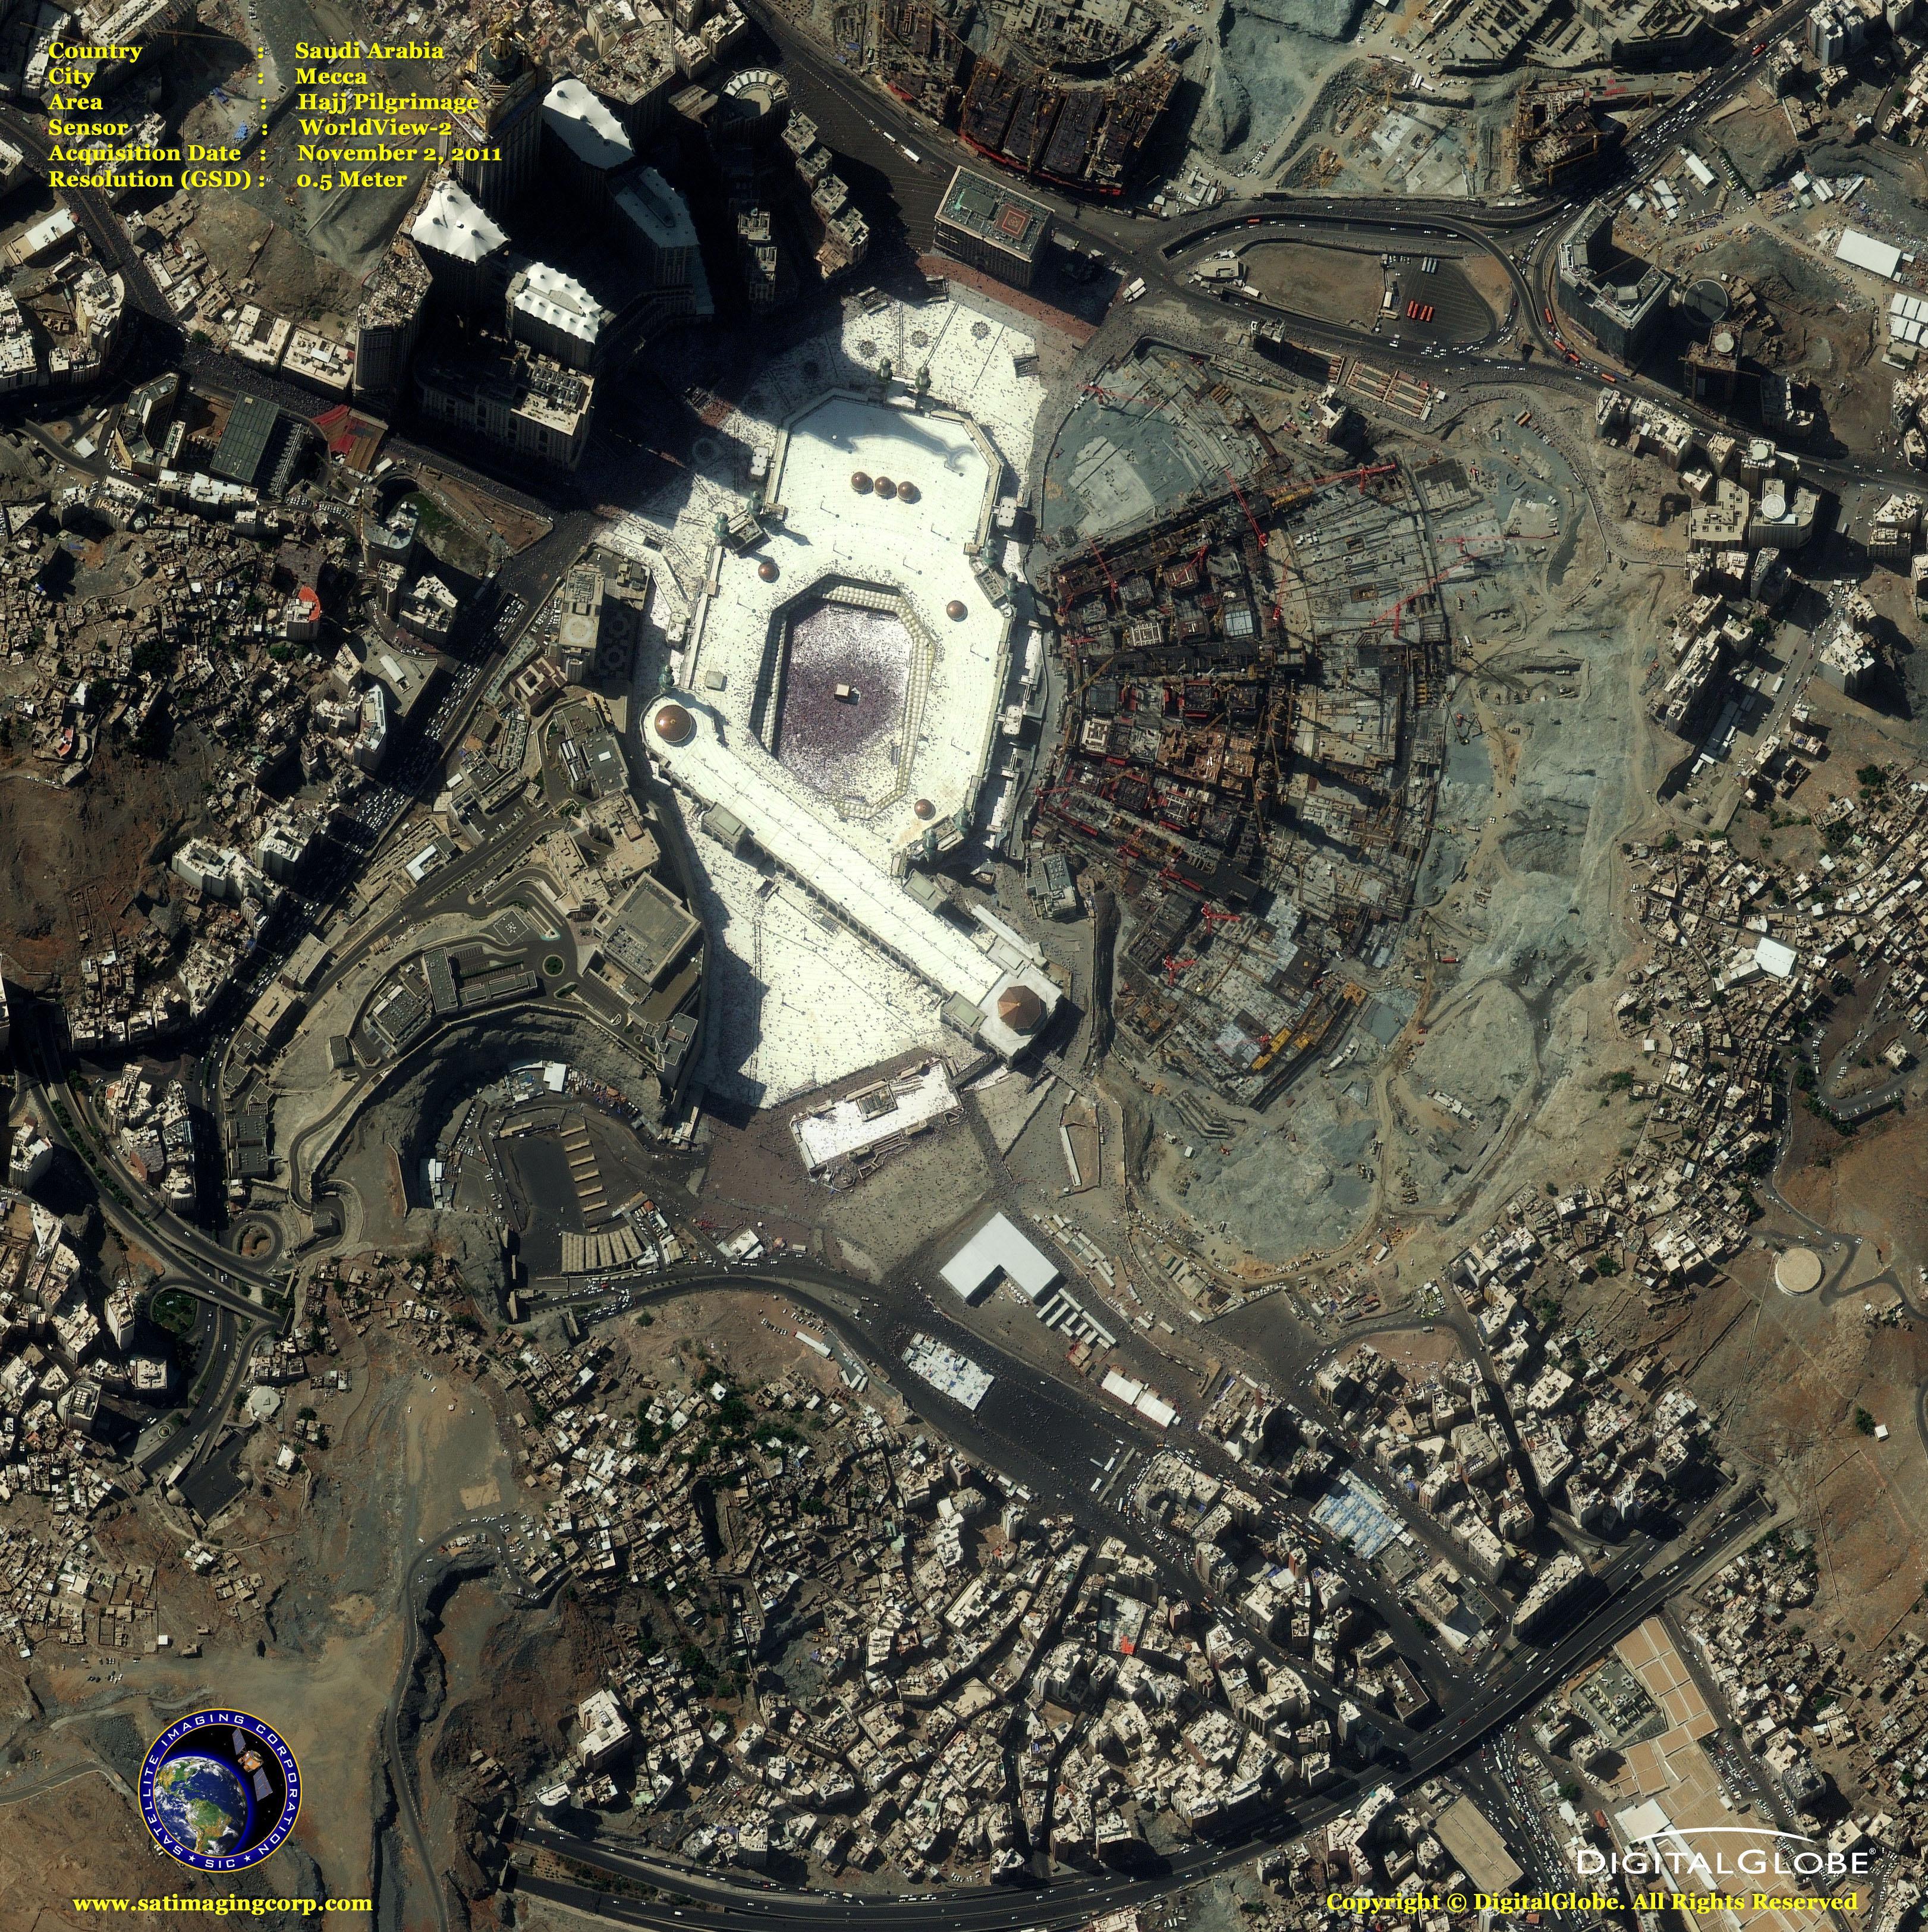 Mekkaja Terkep Muholdas Terkep Mekkaja Terkep Muhold Szaud Arabia